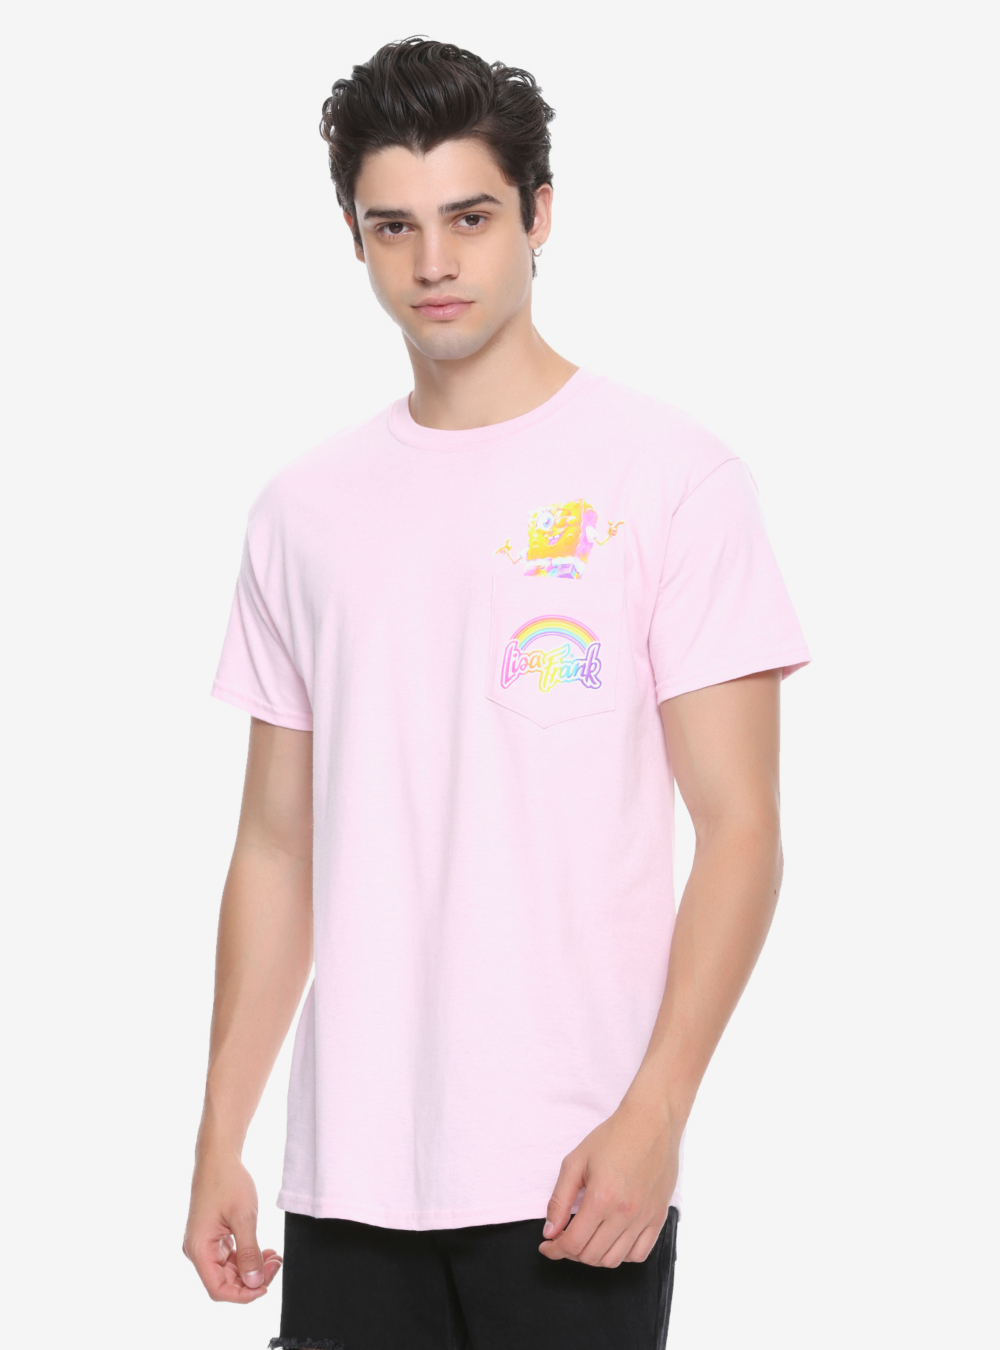 Guys Pink Pocket Tee Front_$22.90.jpg